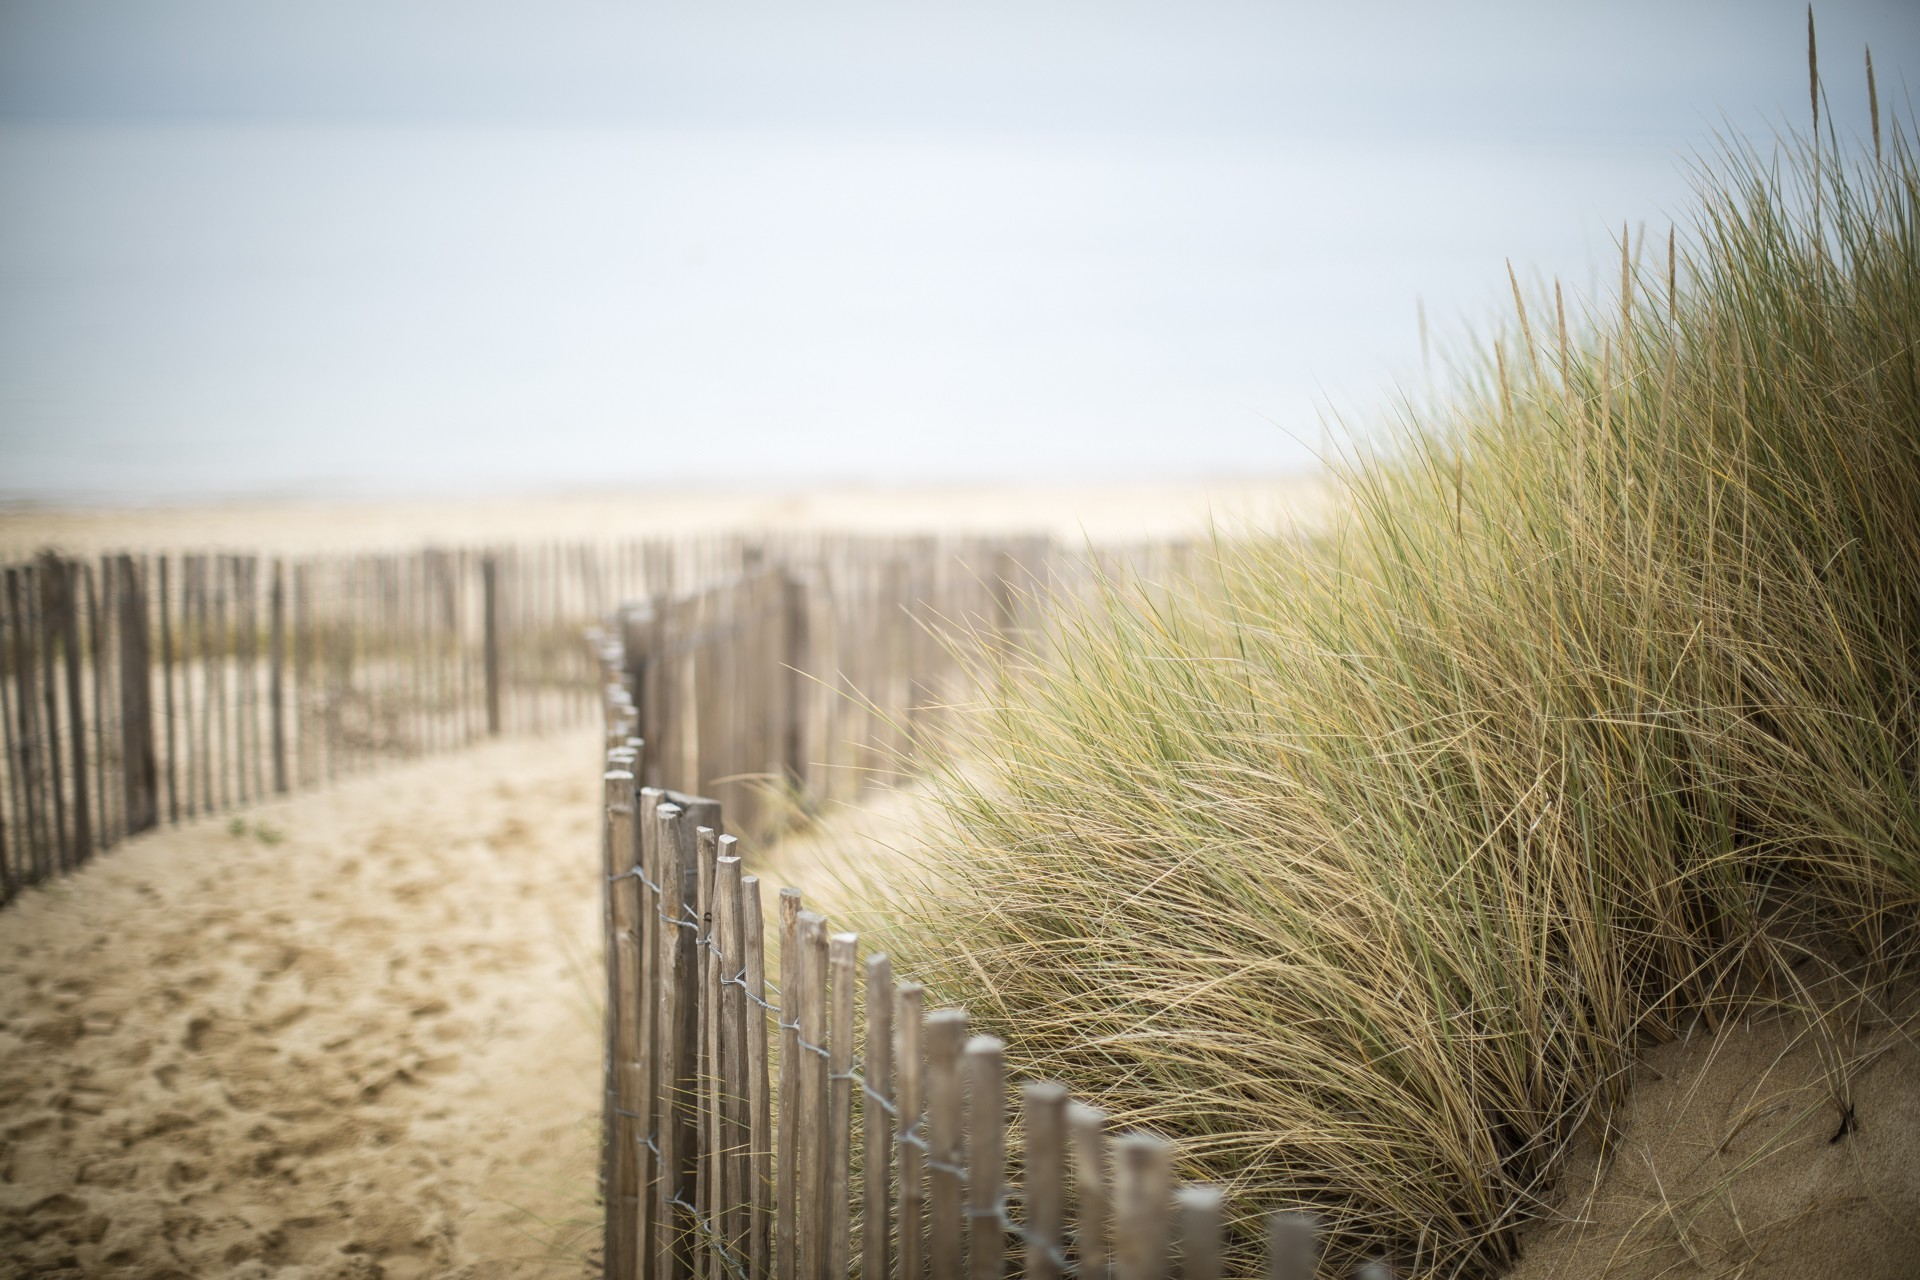 Chemin dans la dune - Morbihan - Août 2020